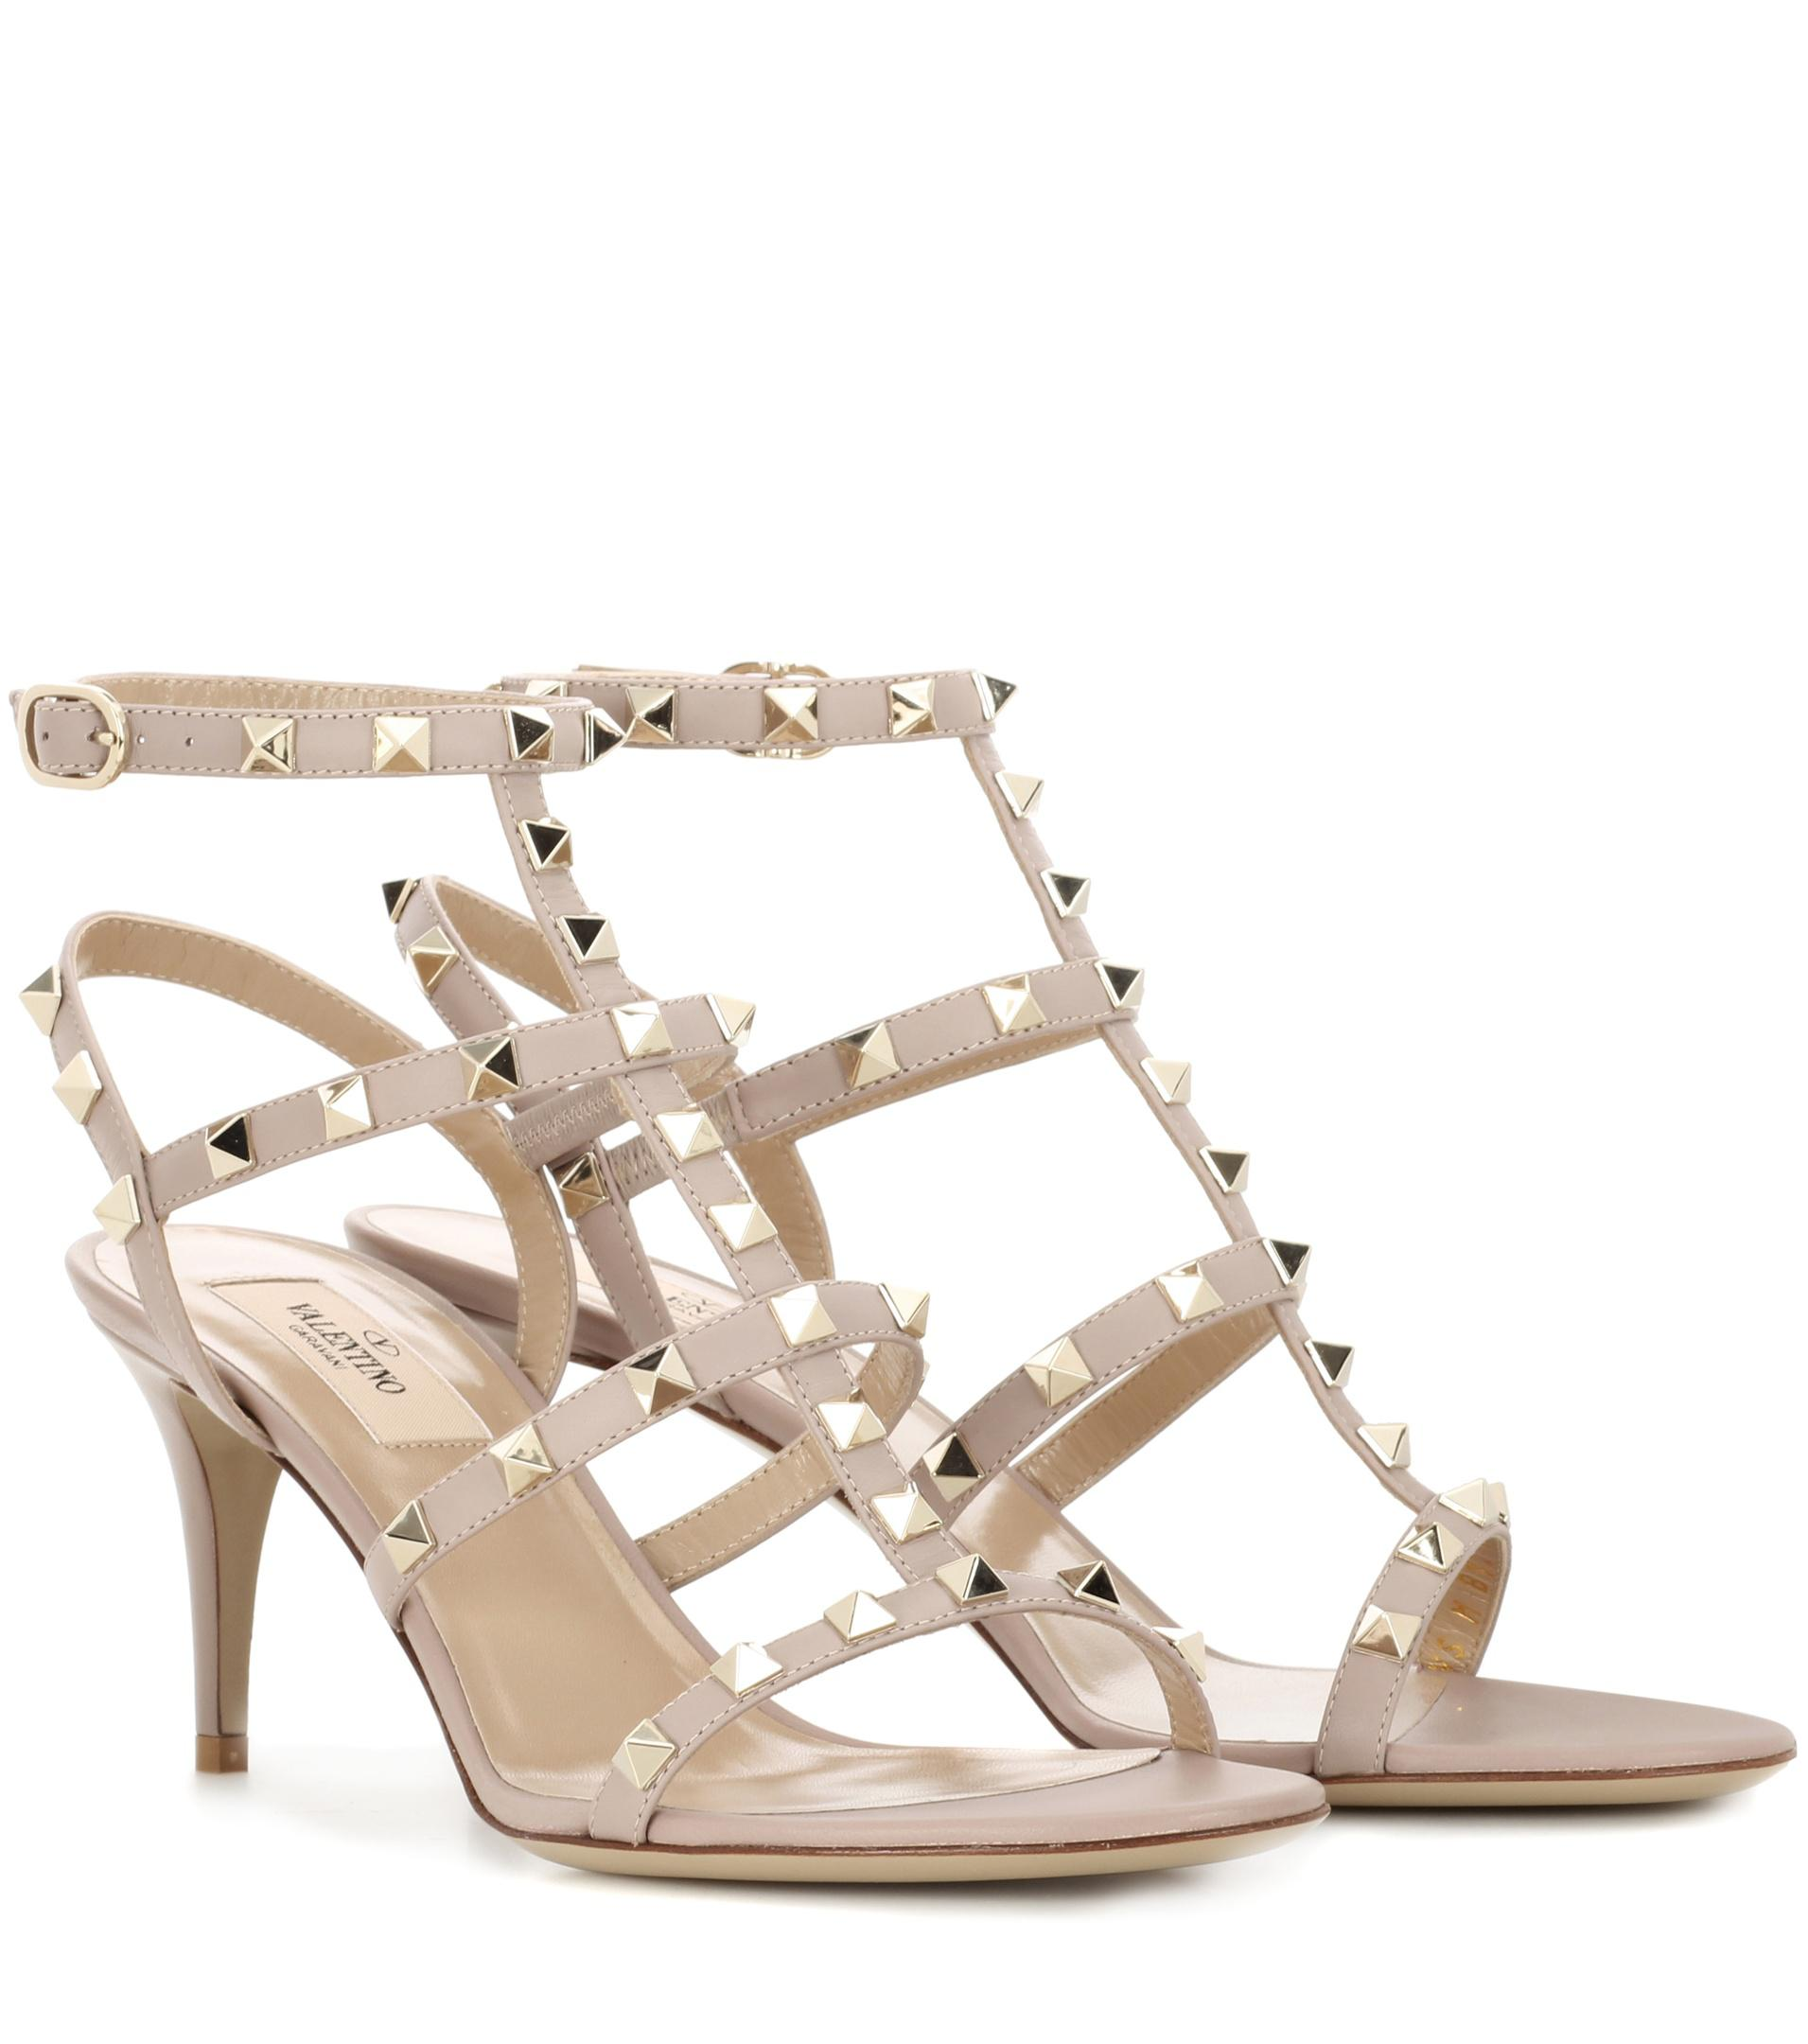 de86ba9a9739 Lyst - Valentino Garavani Rockstud Leather Sandals in Gray